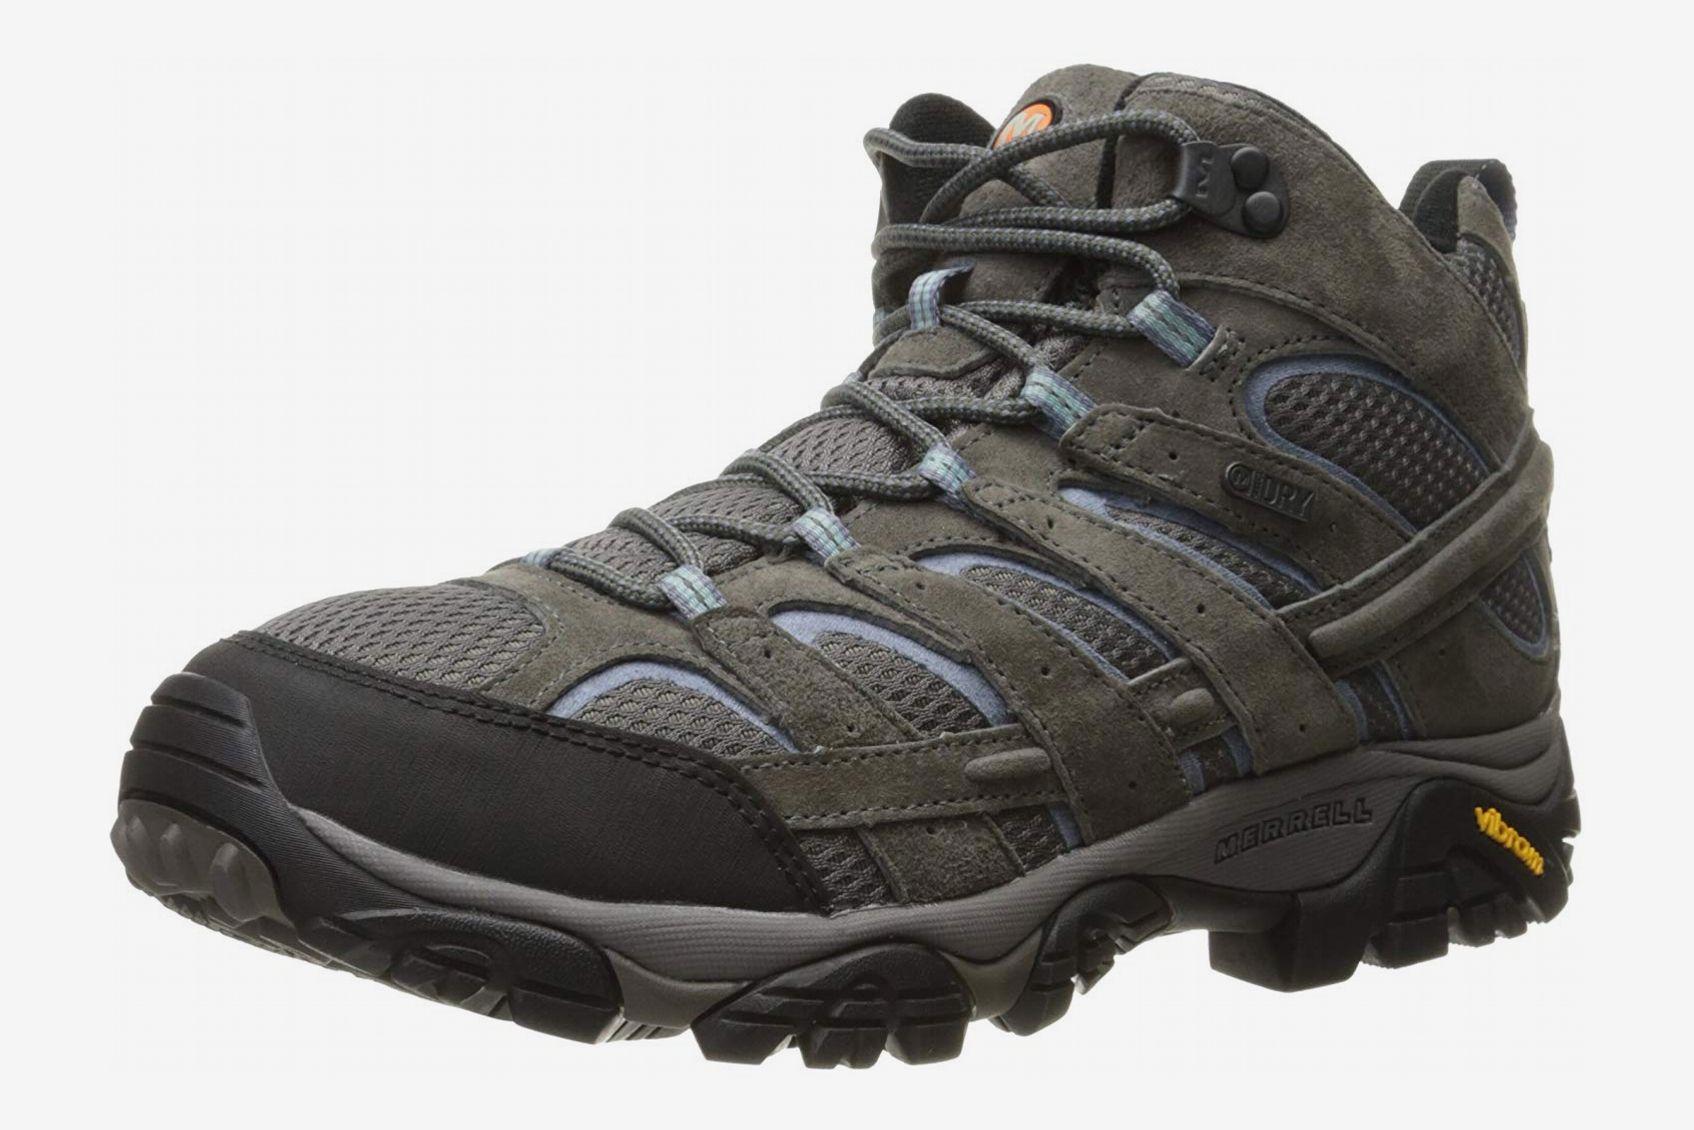 c75326b6fb9 Merrell Women's Moab 2 Mid Waterproof Hiking Boot at Amazon